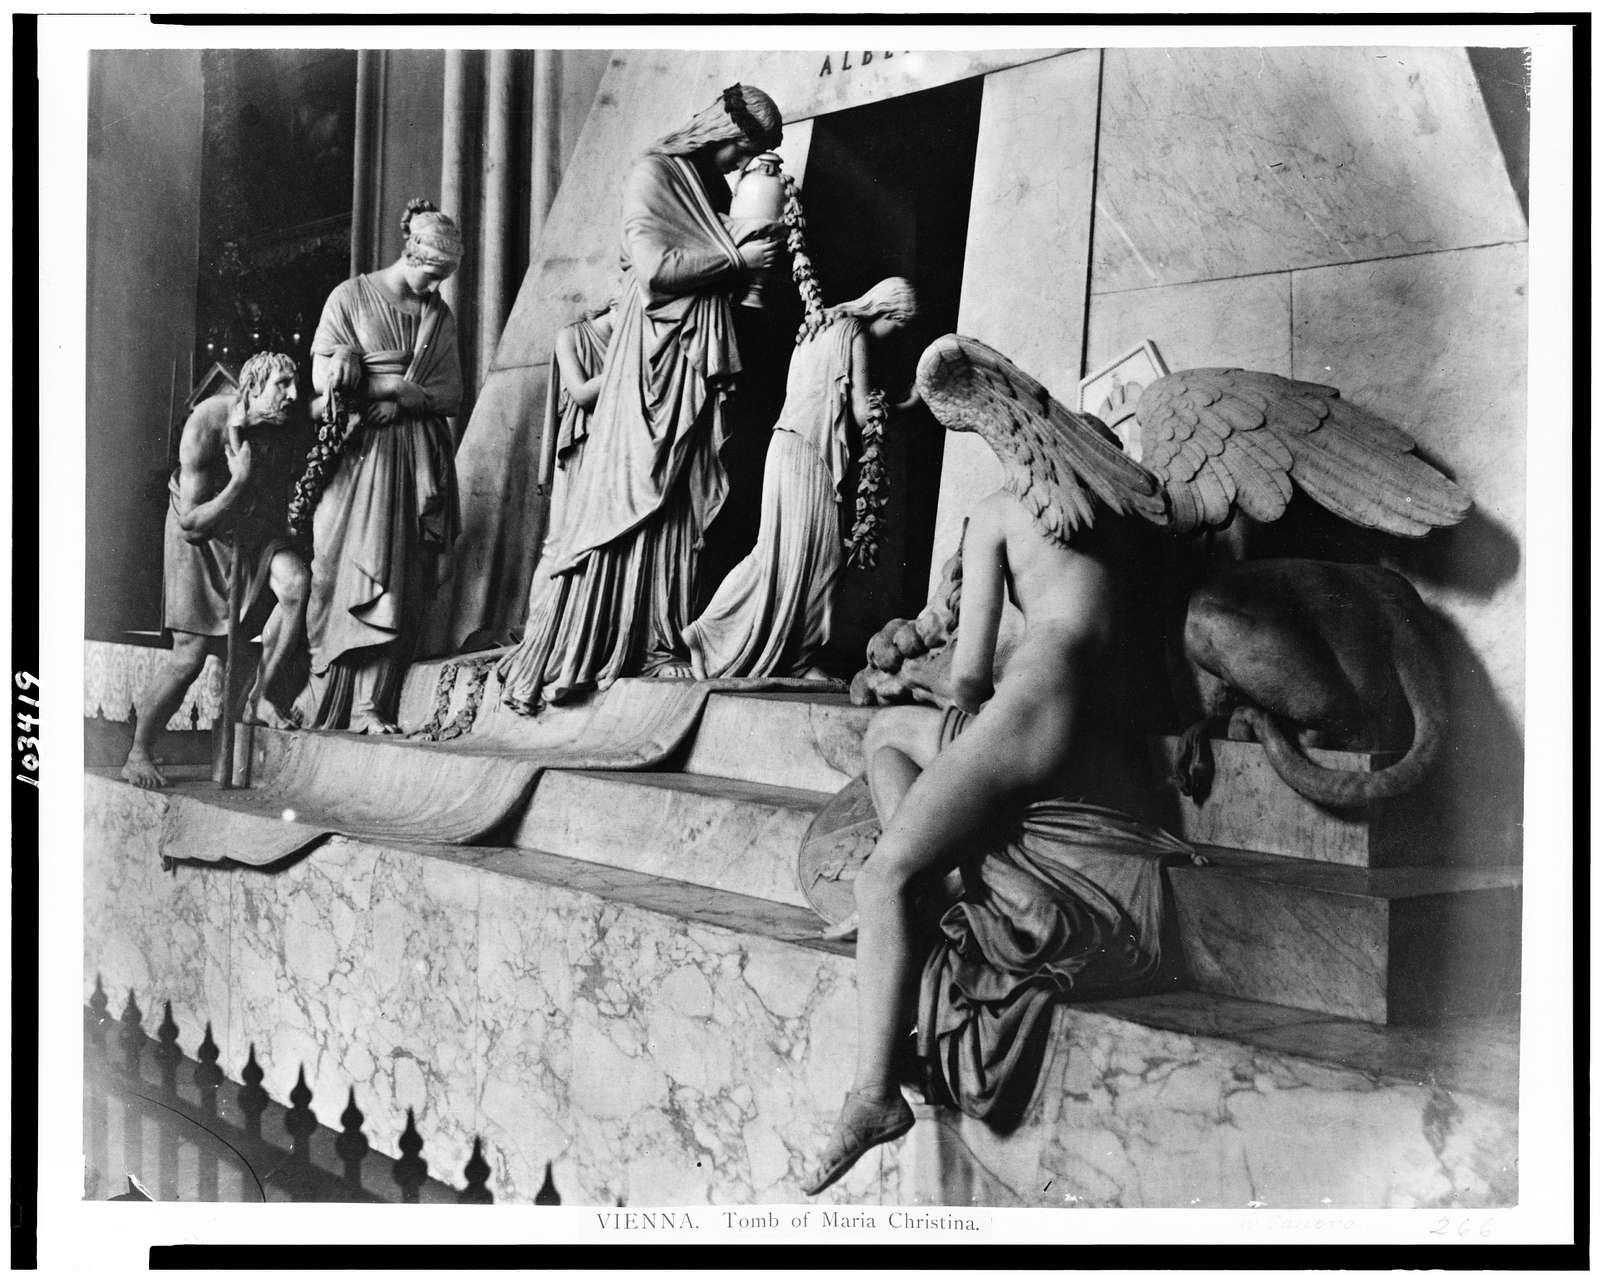 Vienna. Tomb of Maria Christina